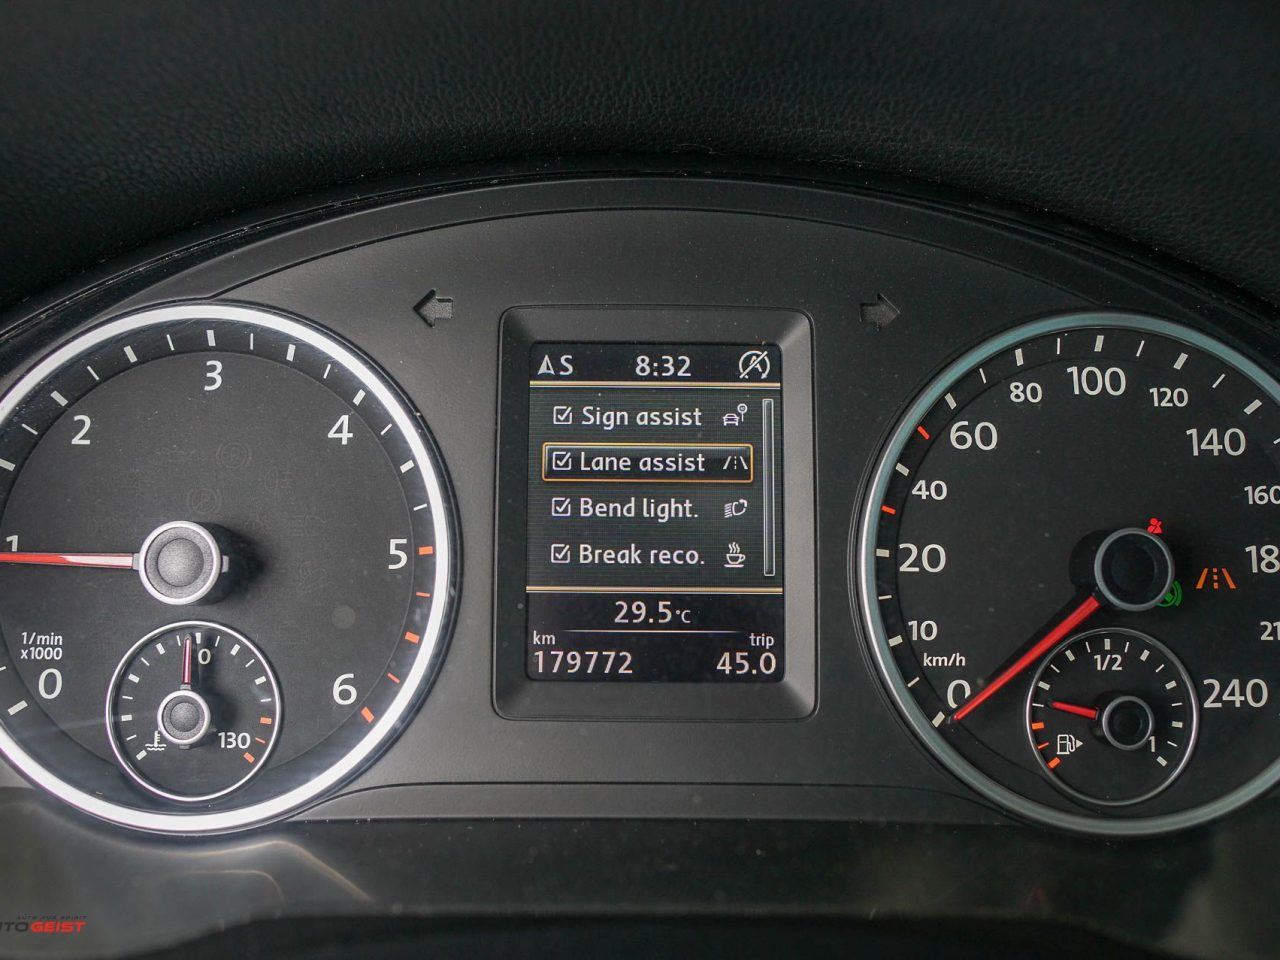 volkswagen-tiguan-4motion-dsg-panoramic-01233